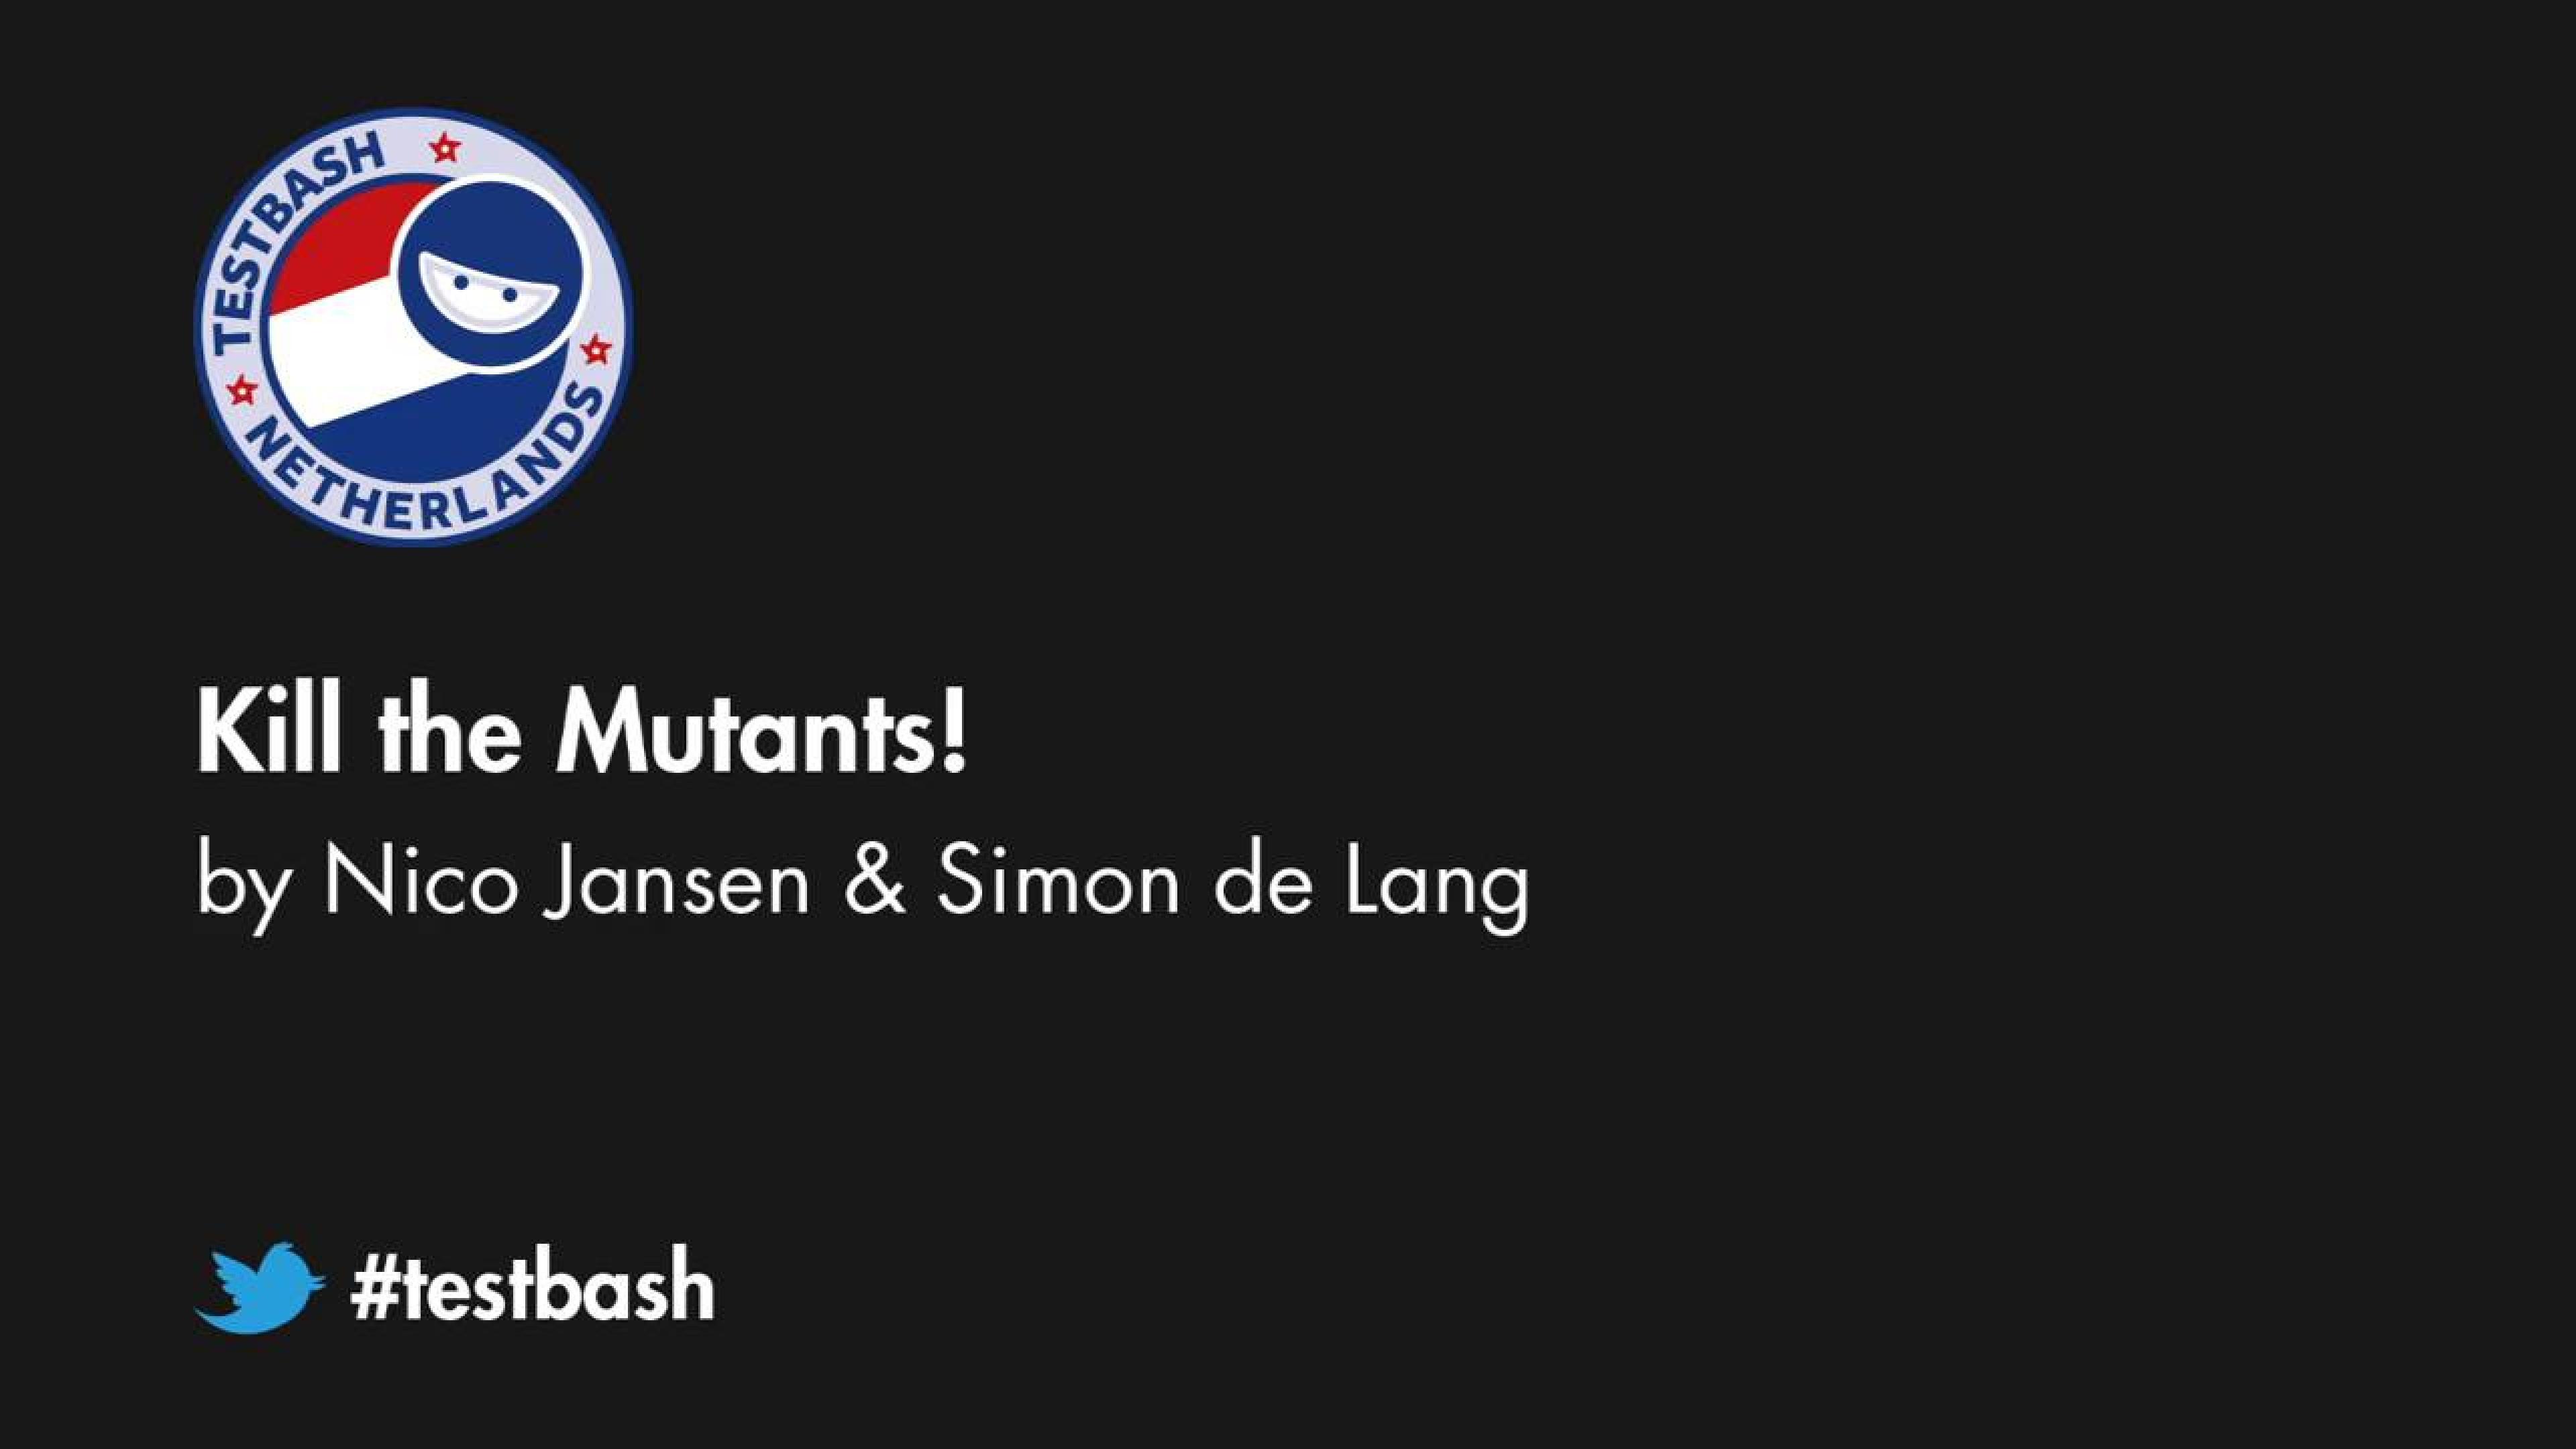 Kill the Mutants! - Nico Jansen & Simon de Lang